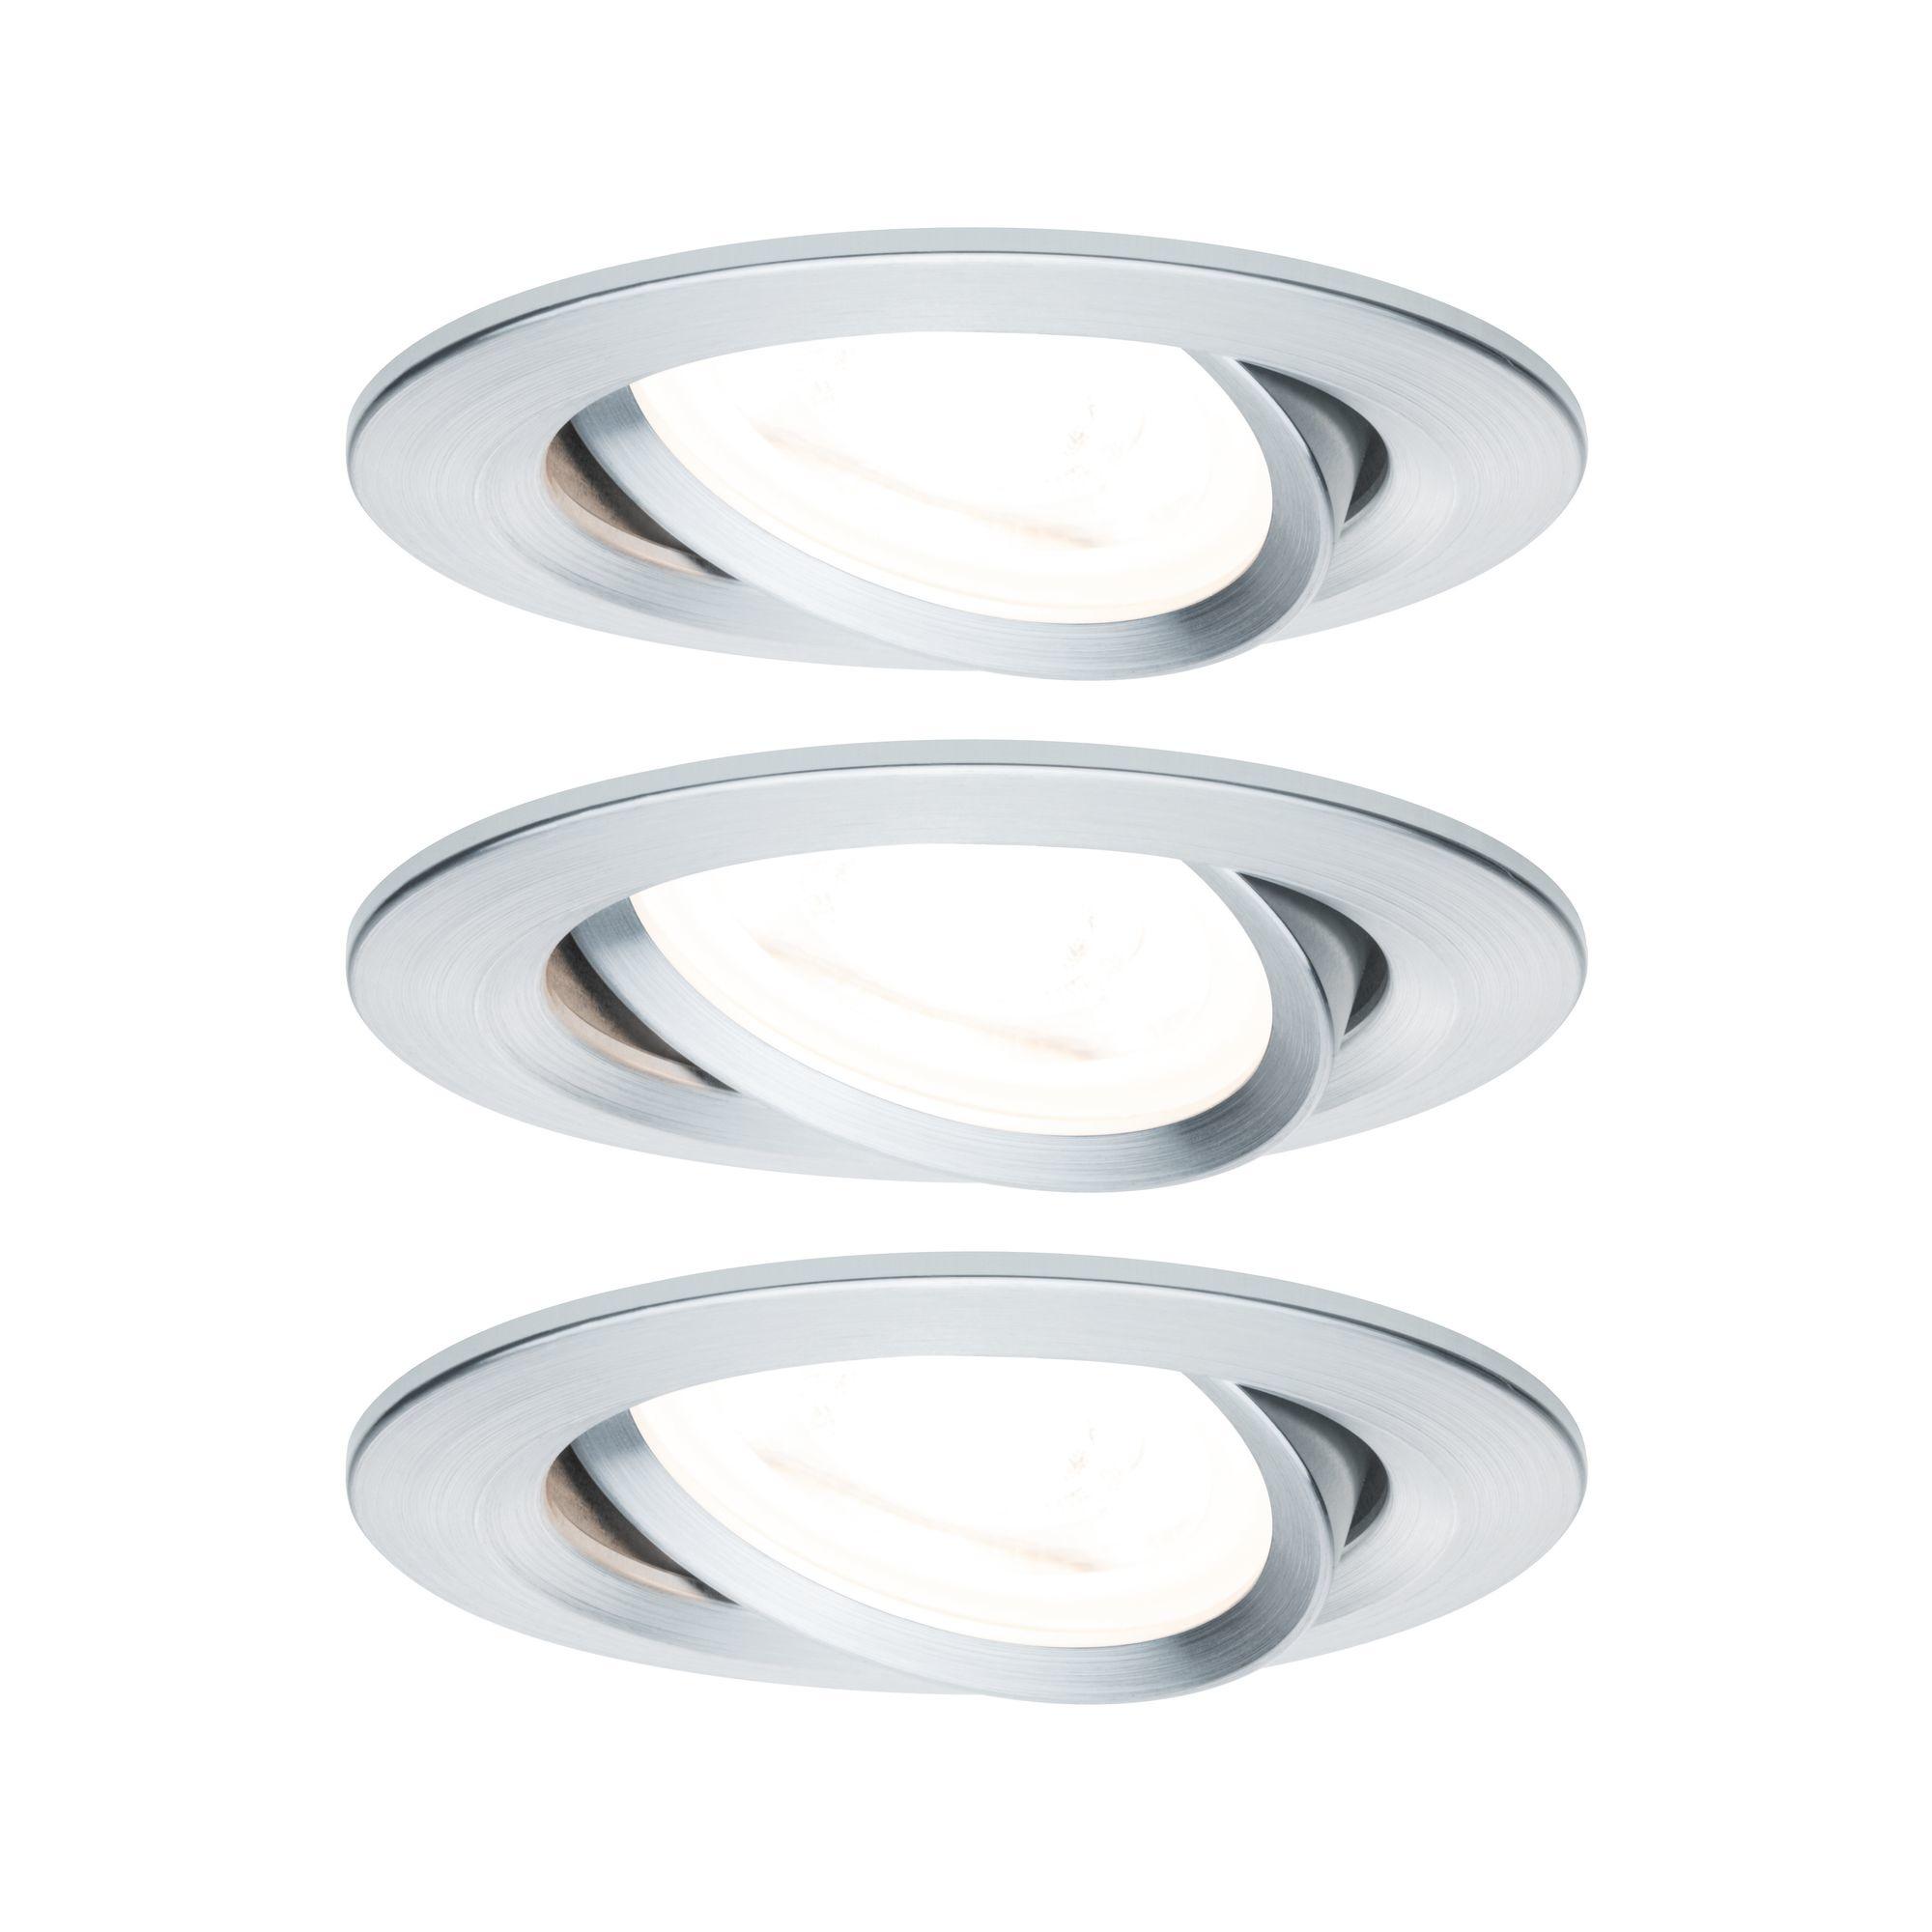 Paulmann EBL Set Nova rd schw LED 3stepdim 3x6,5W230V GU10 51mm Alu gedreht/Alu